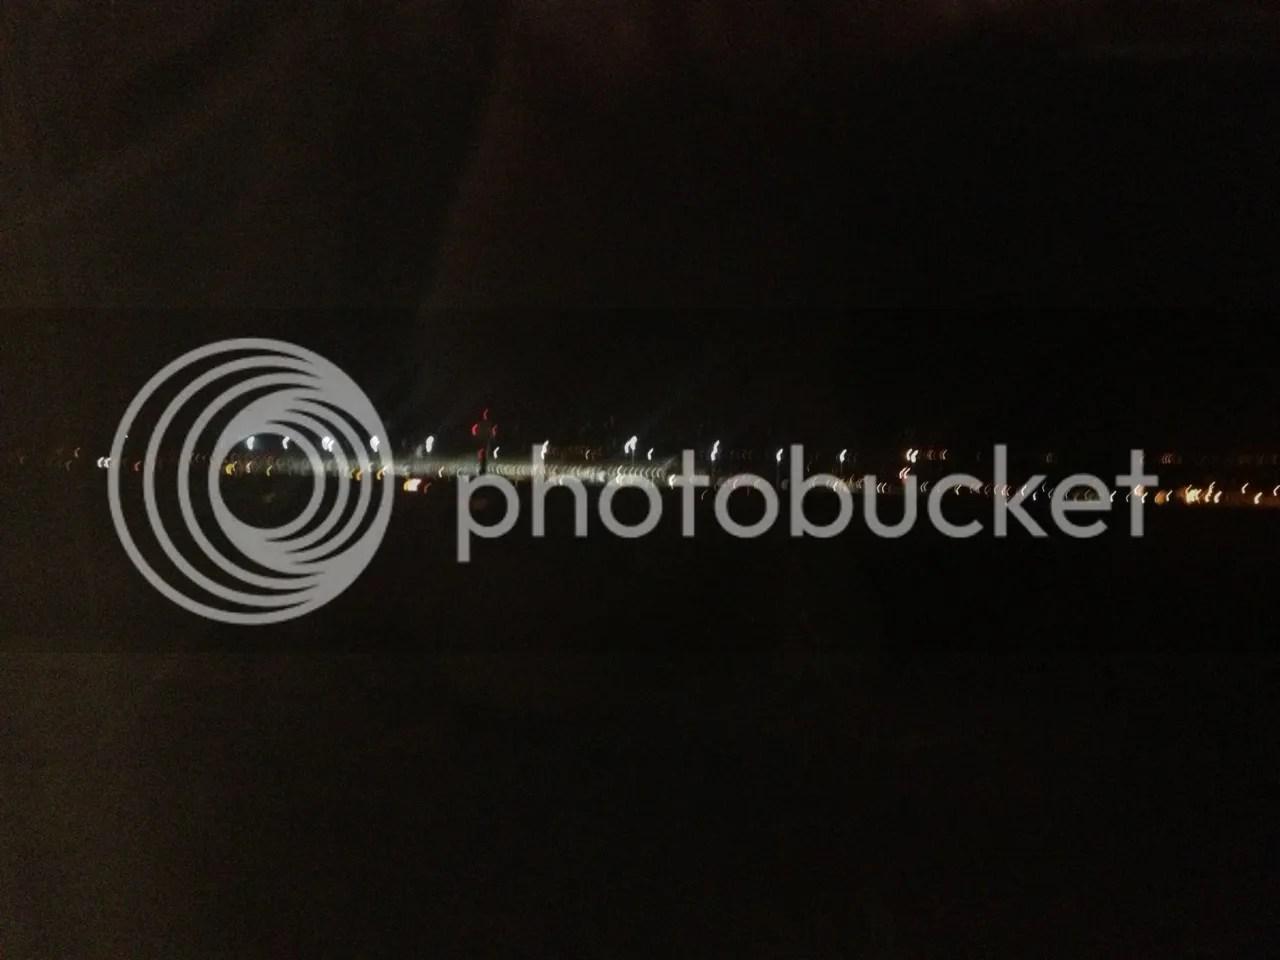 https://i2.wp.com/i181.photobucket.com/albums/x35/jwhite9185/Madrid/file-95.jpg